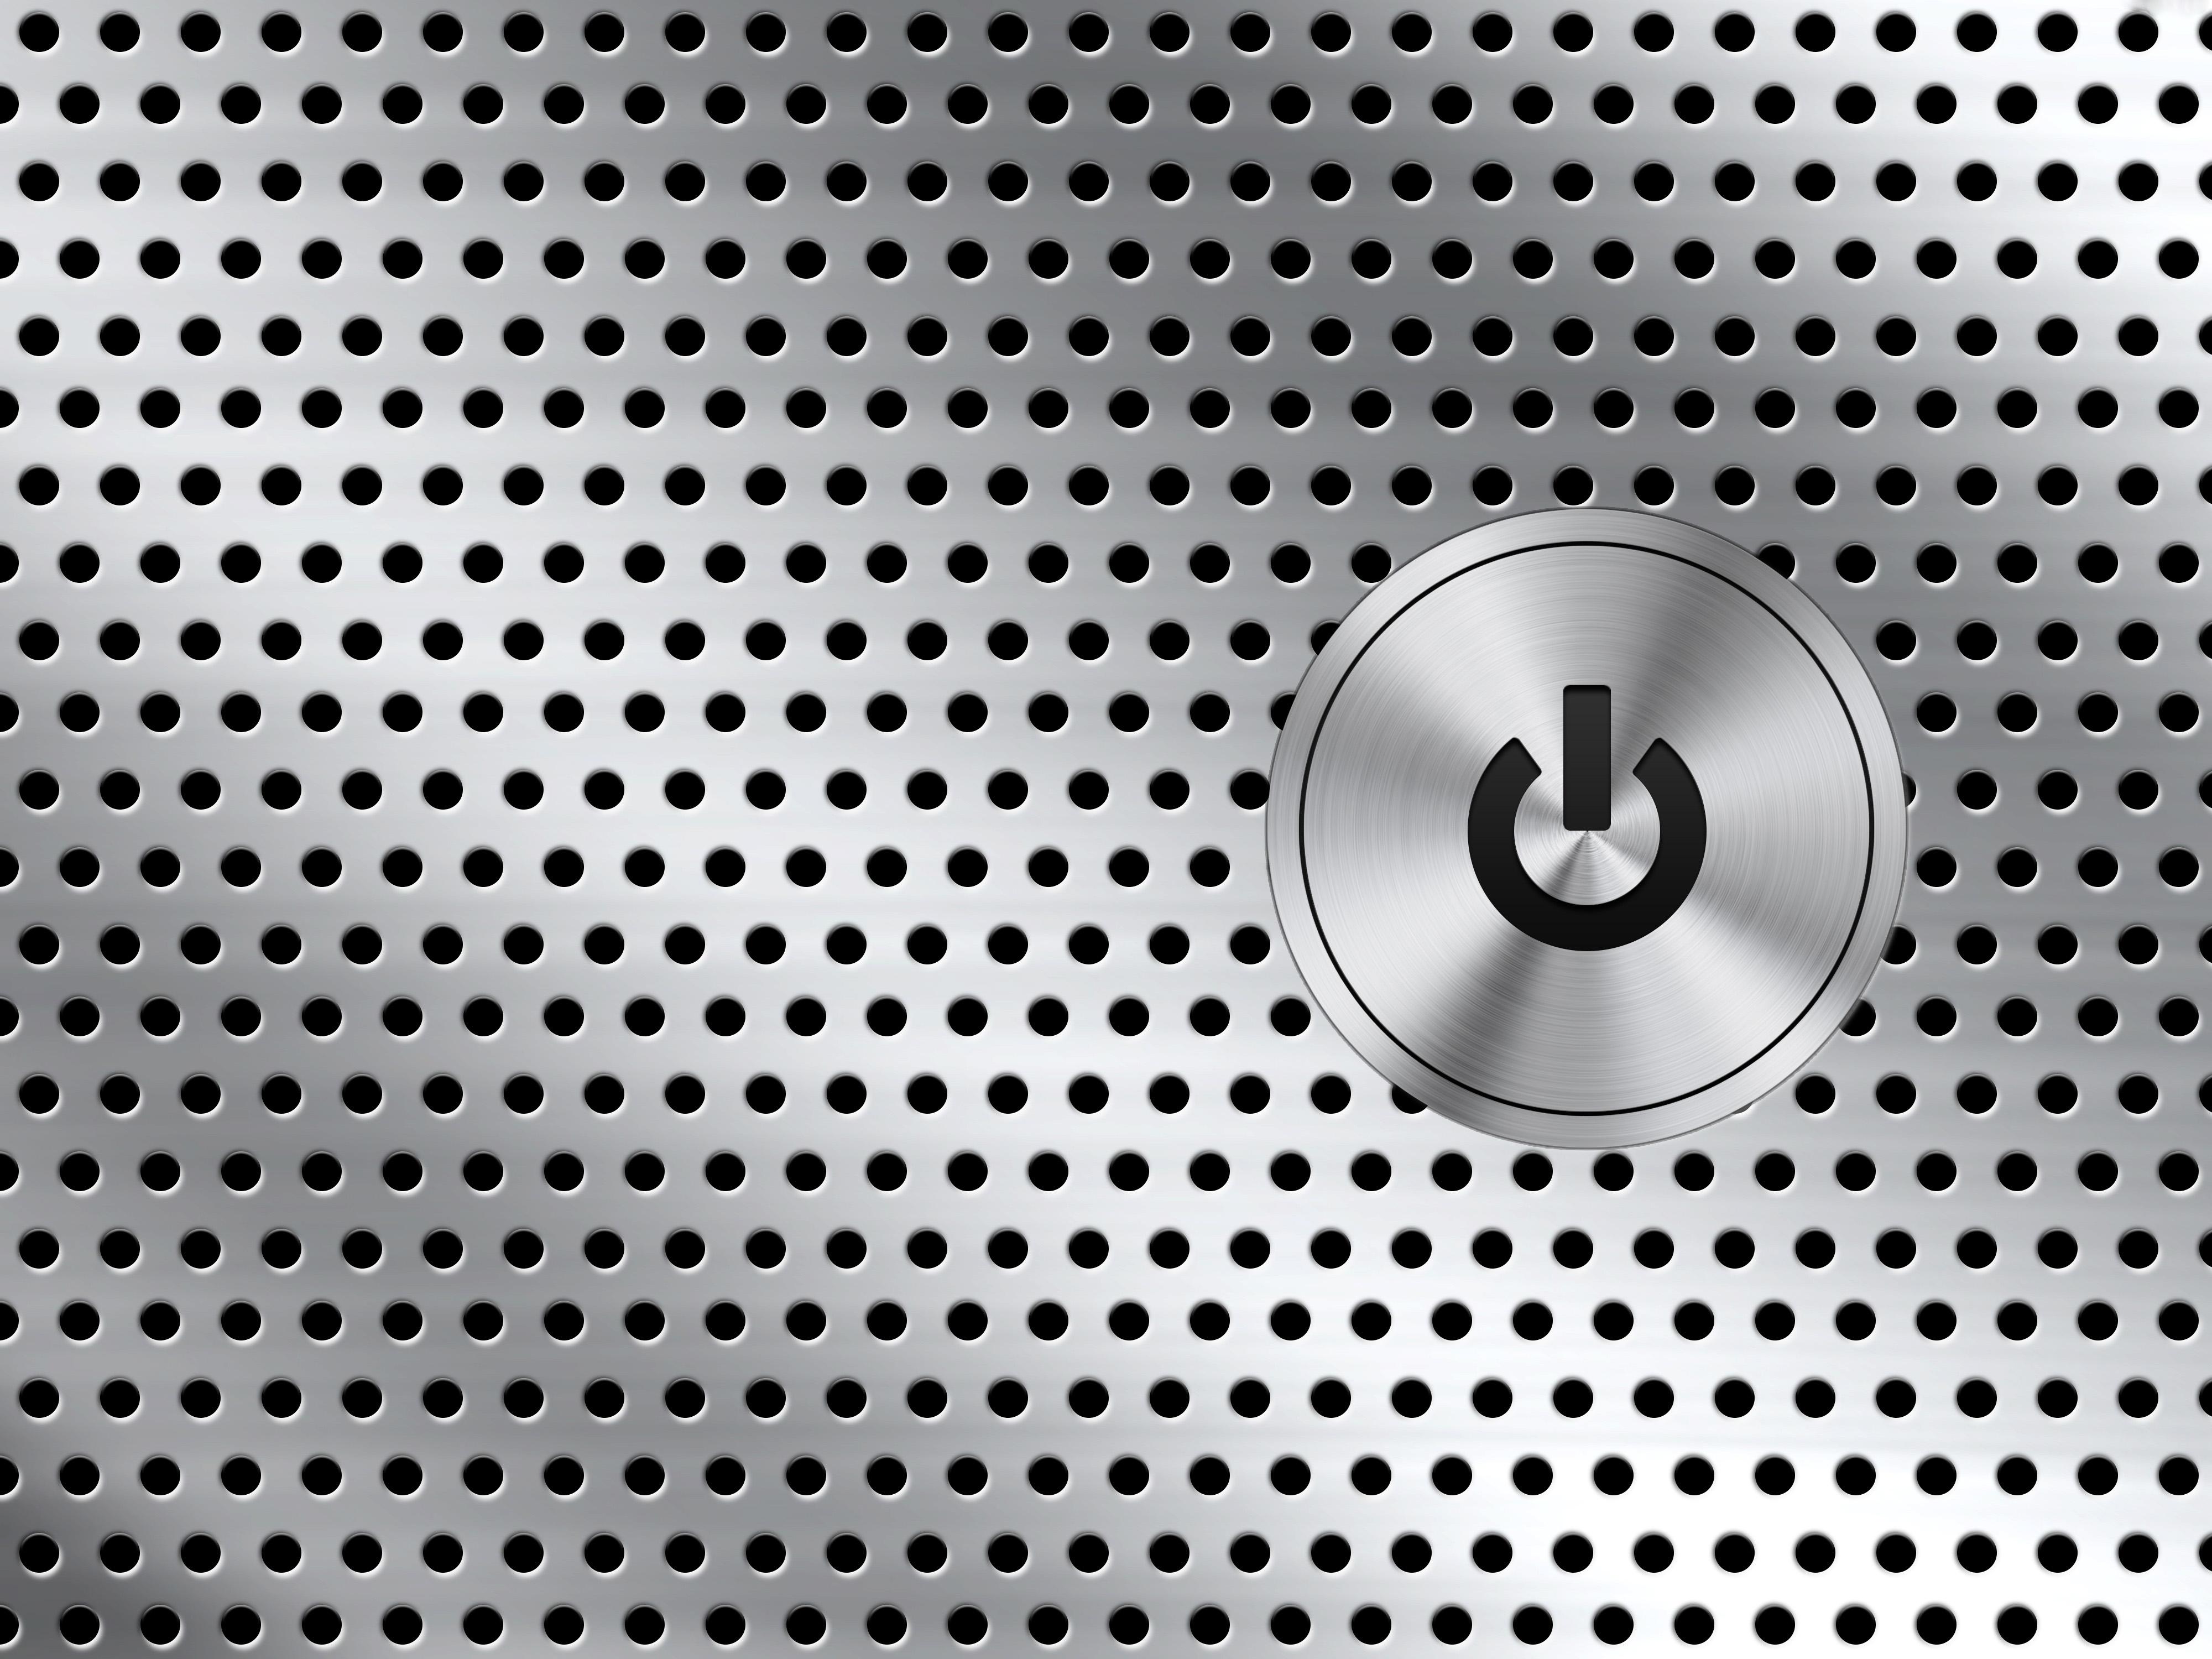 aluminum grid, download photo, background, aluminium texture backgroud, grid metal